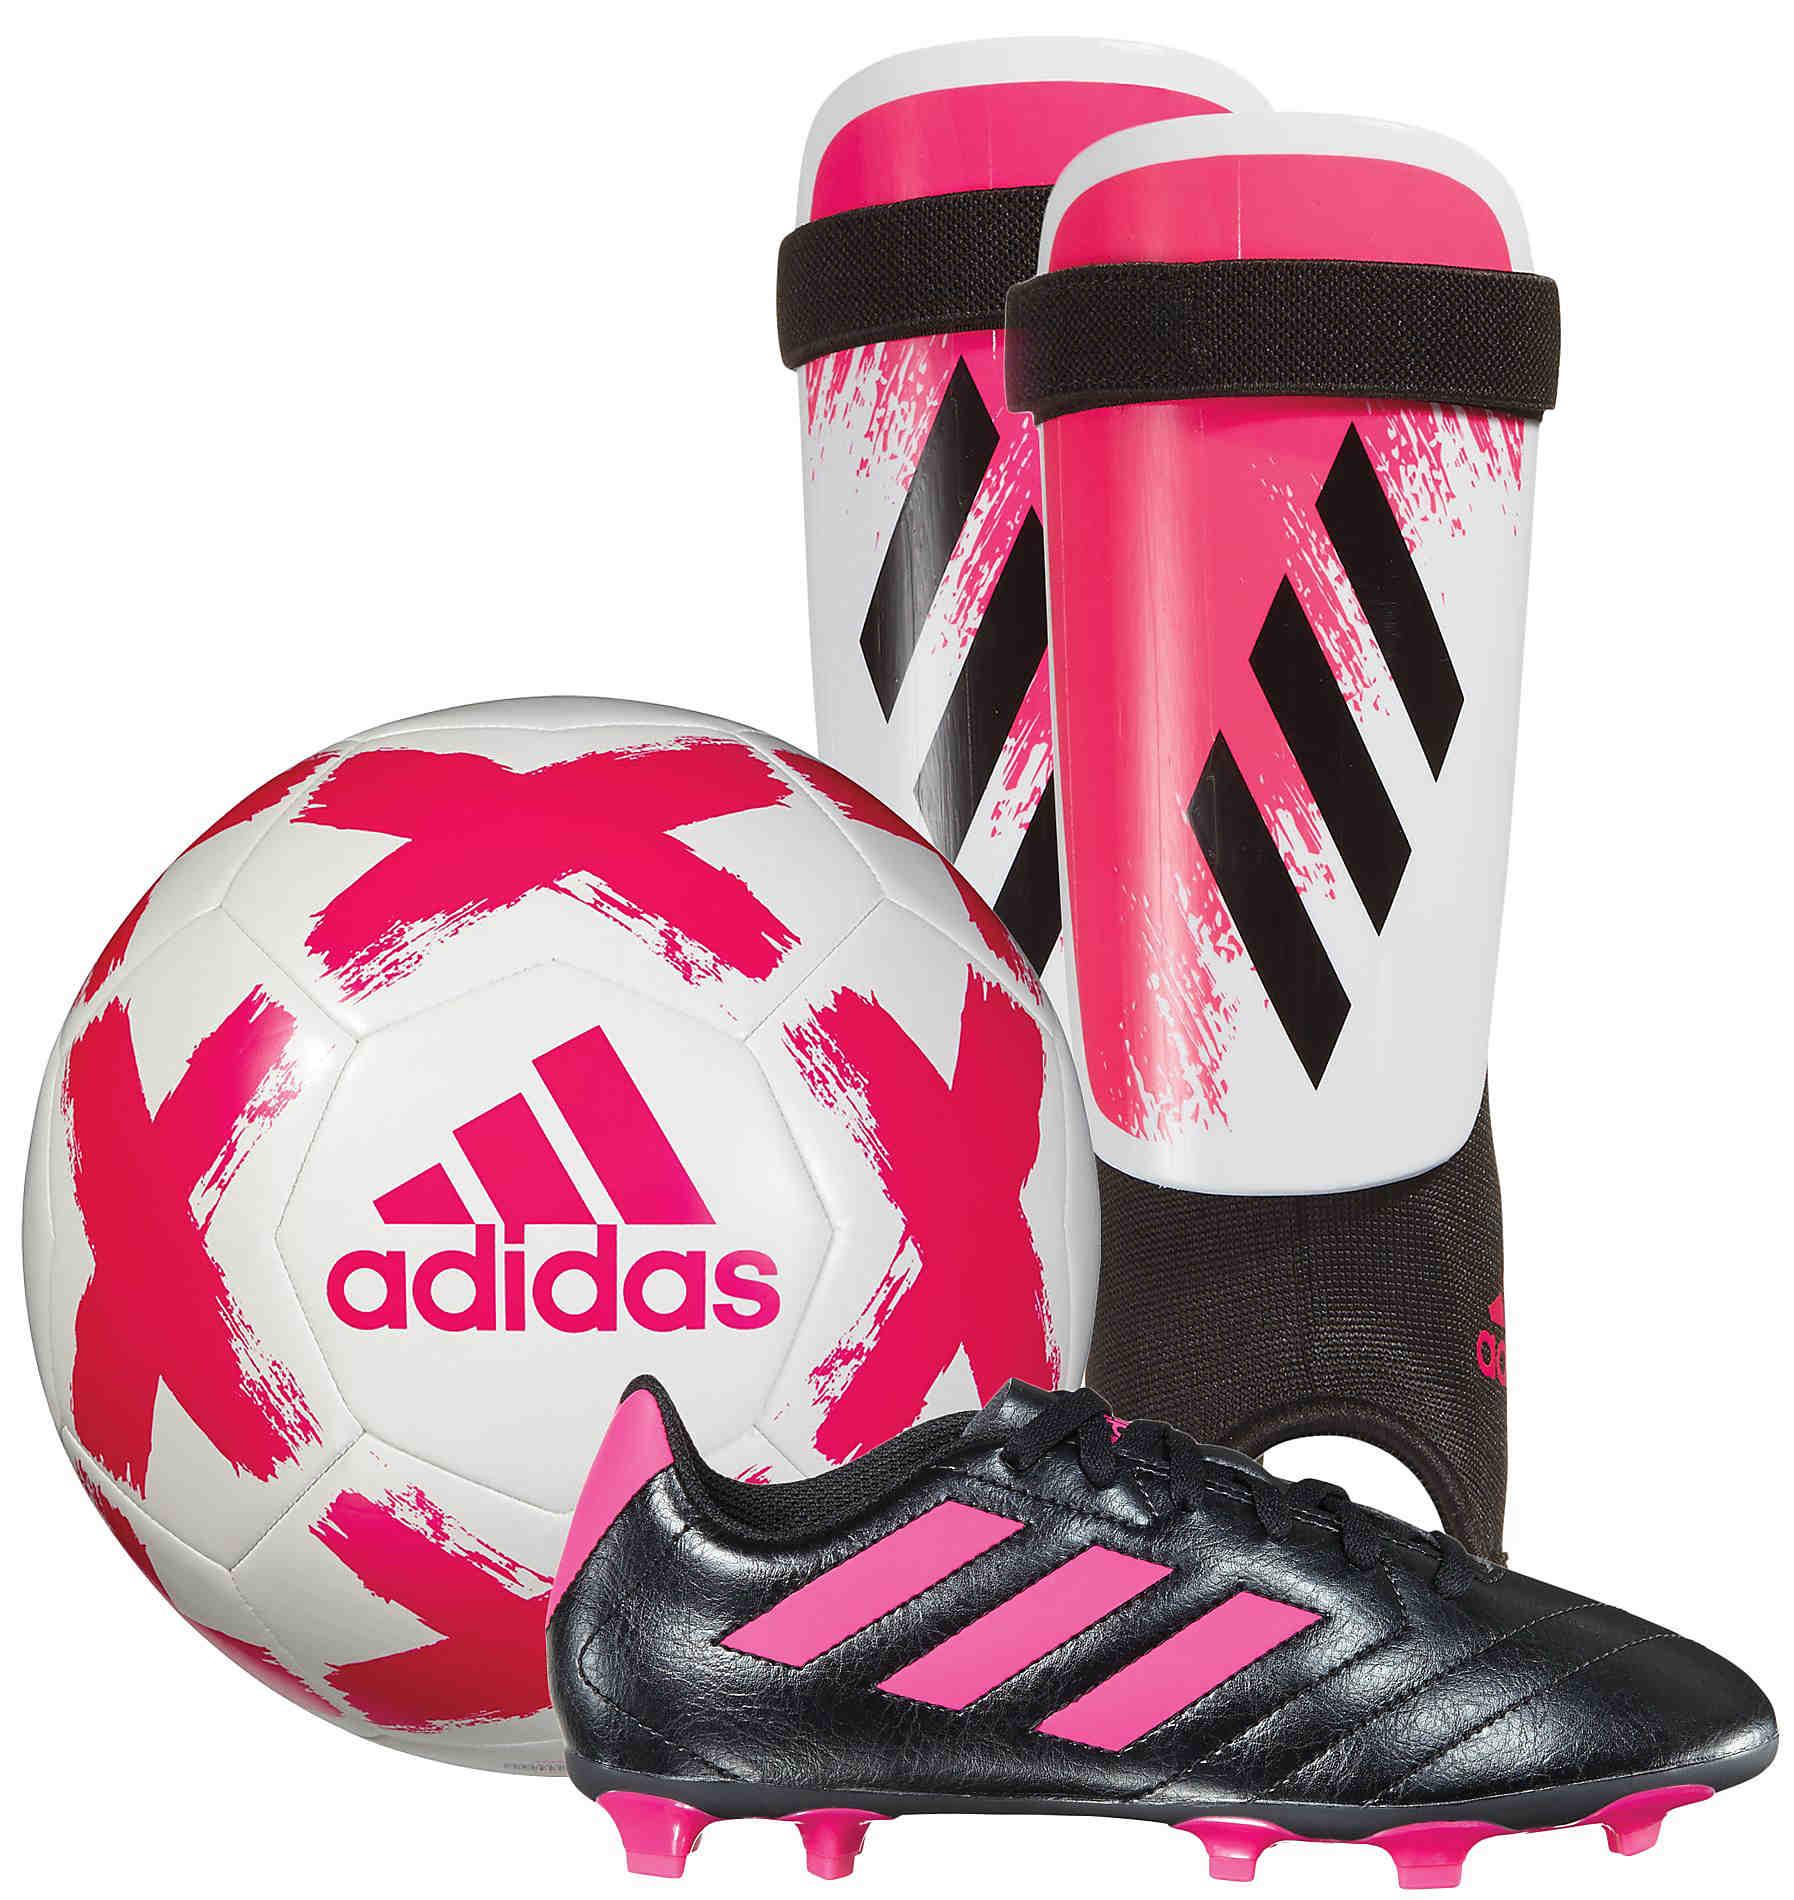 adidas Youth Soccer Starter Kit Pink